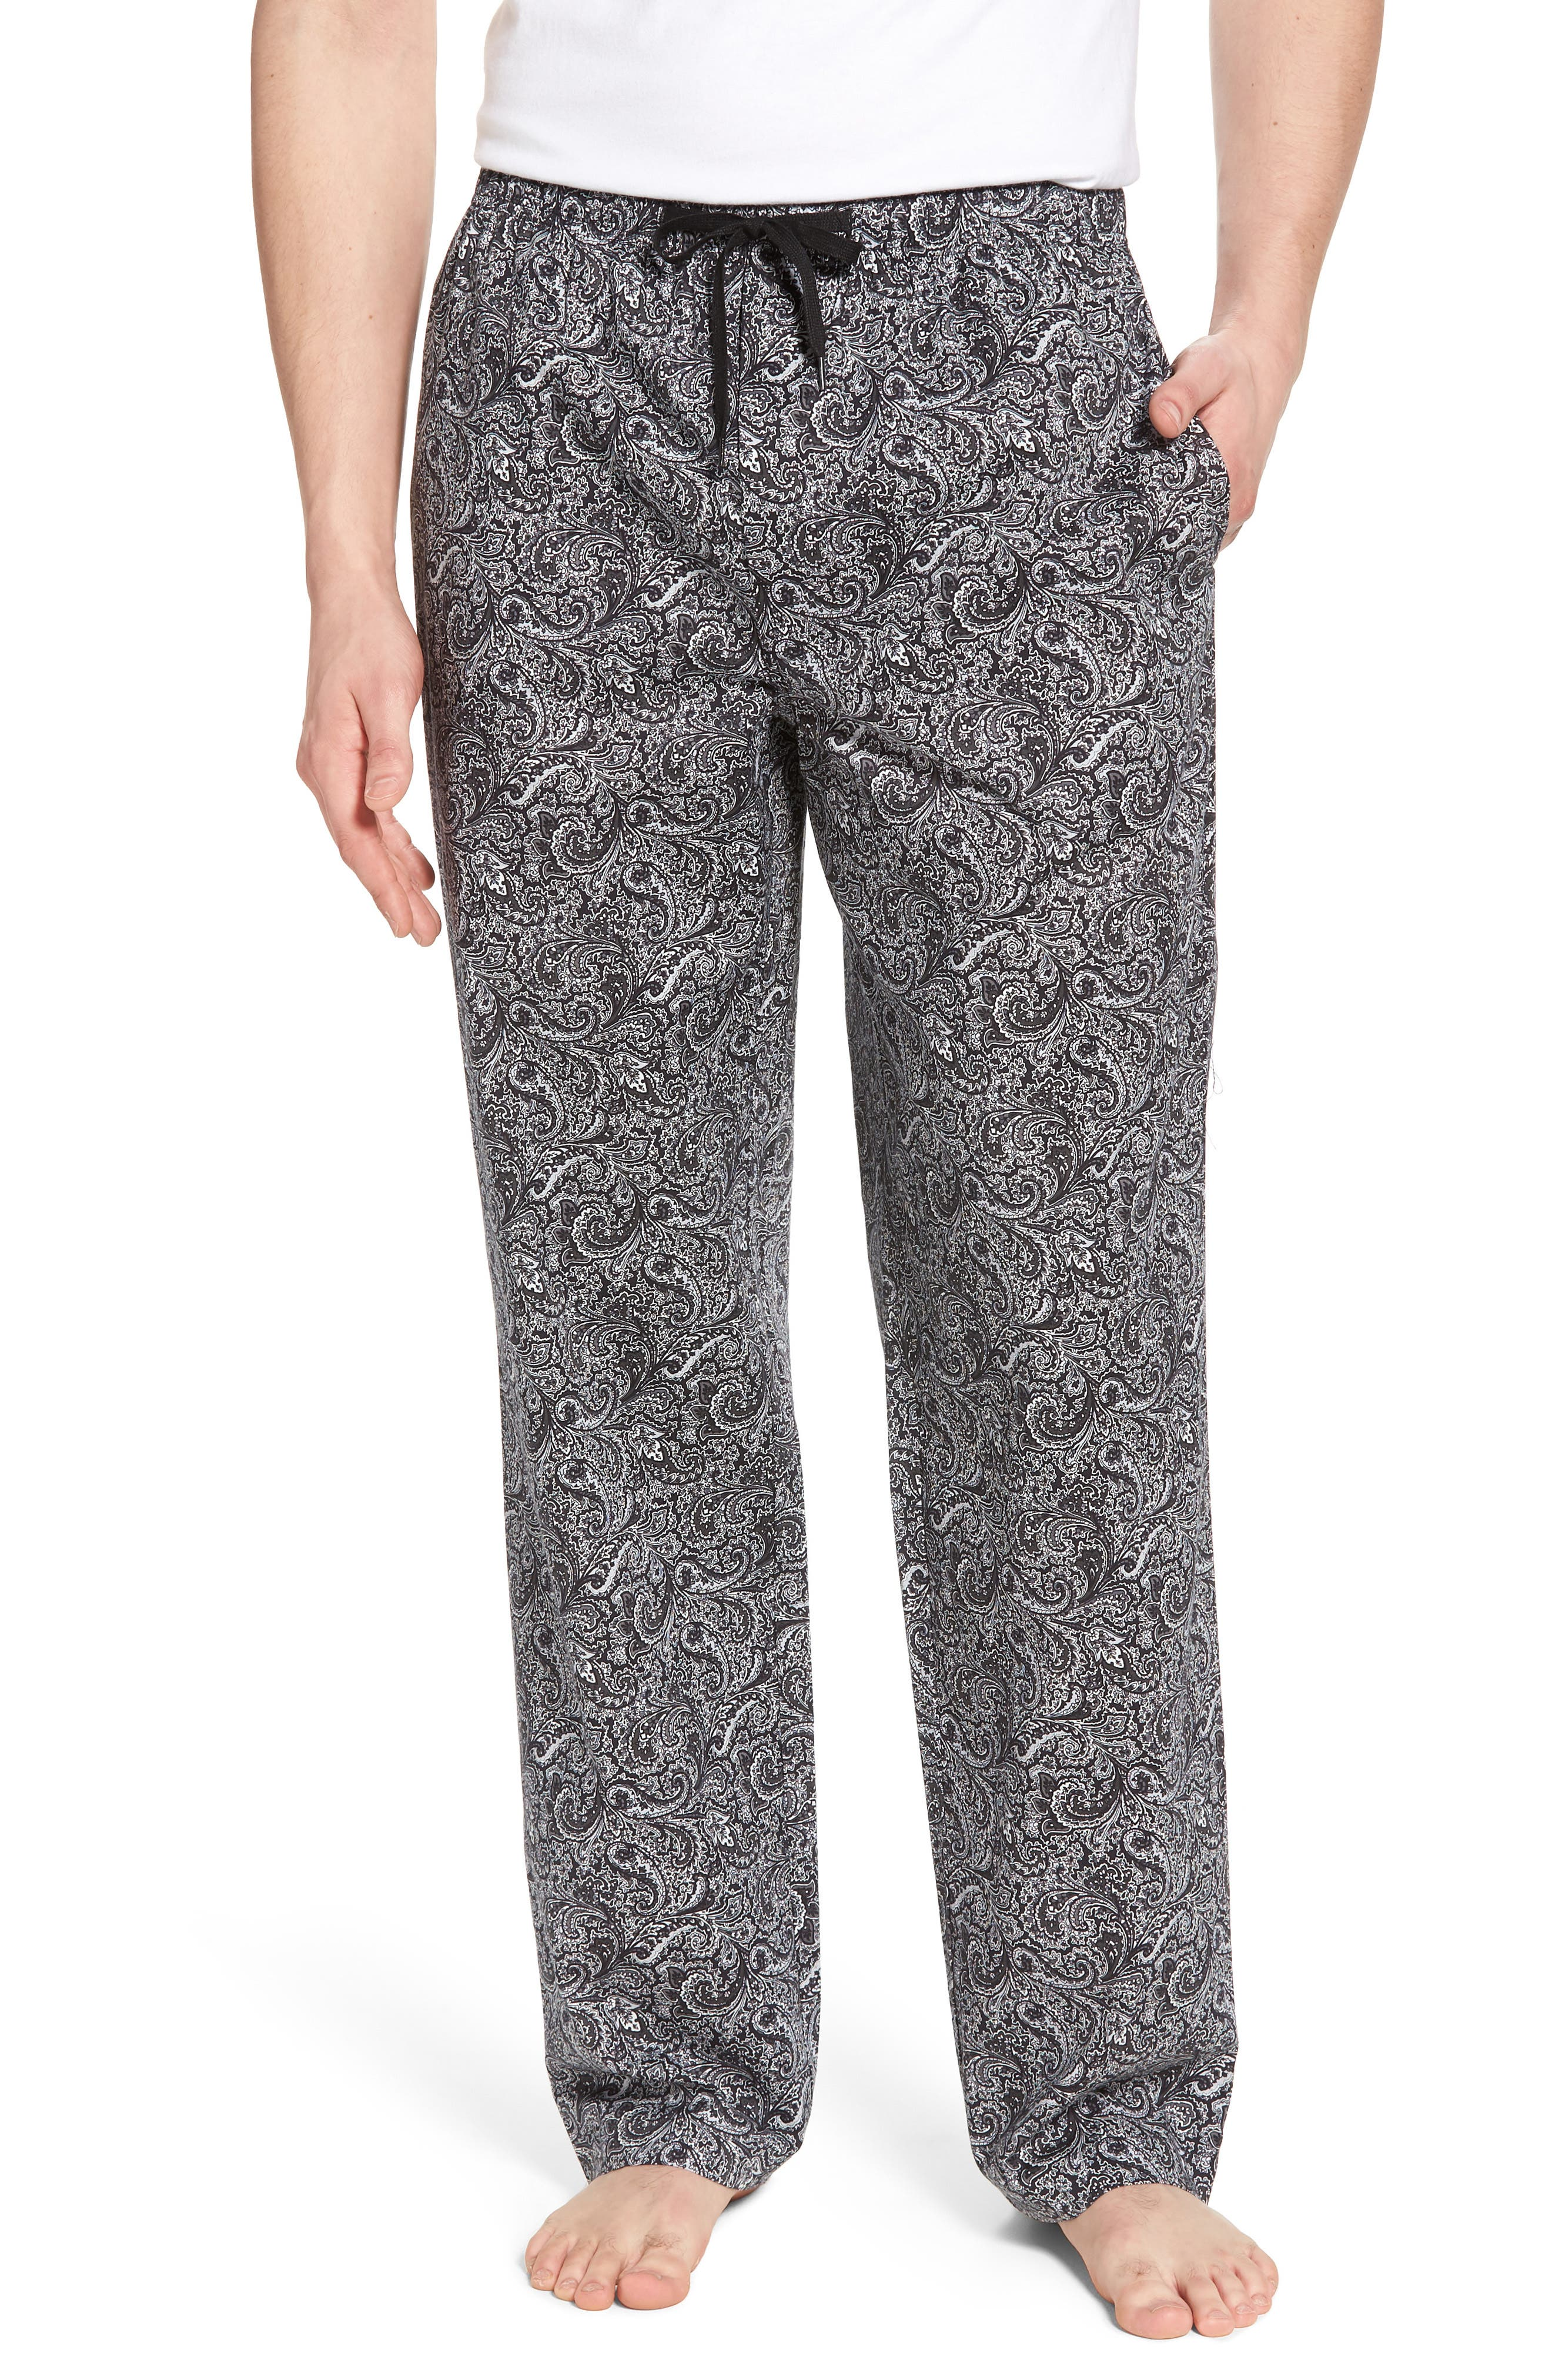 MAJESTIC INTERNATIONAL Starling Lounge Pants, Main, color, 002